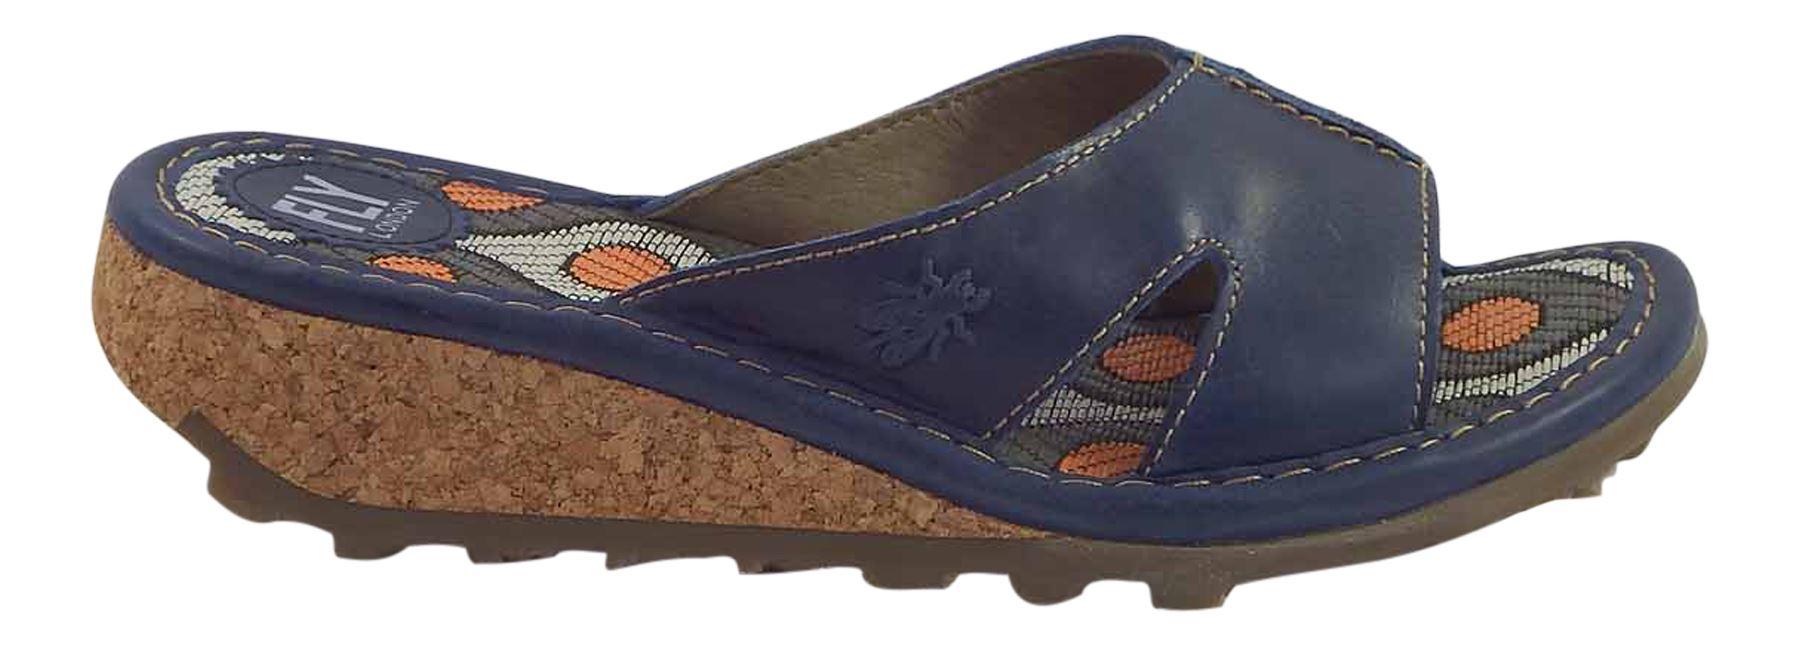 Fly-London-Ladies-Kert-740-Luxury-Rug-Leather-Open-Toe-Mule-Summer-Sandals